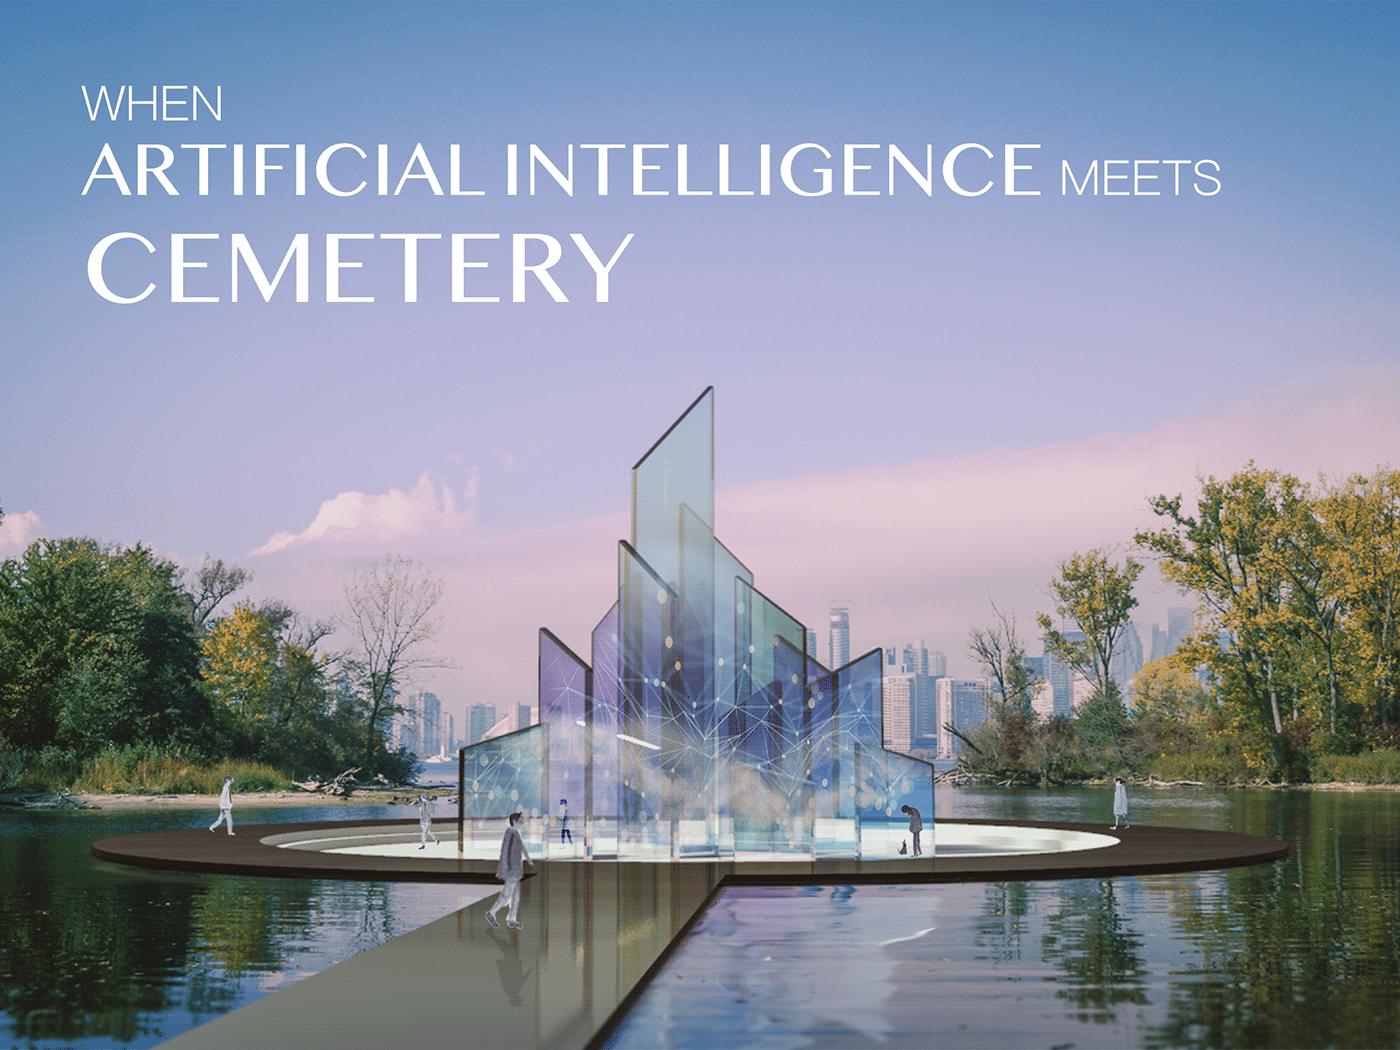 ai architecture artificial intelligence cemetery grave graveyard installation interactive public art Technology